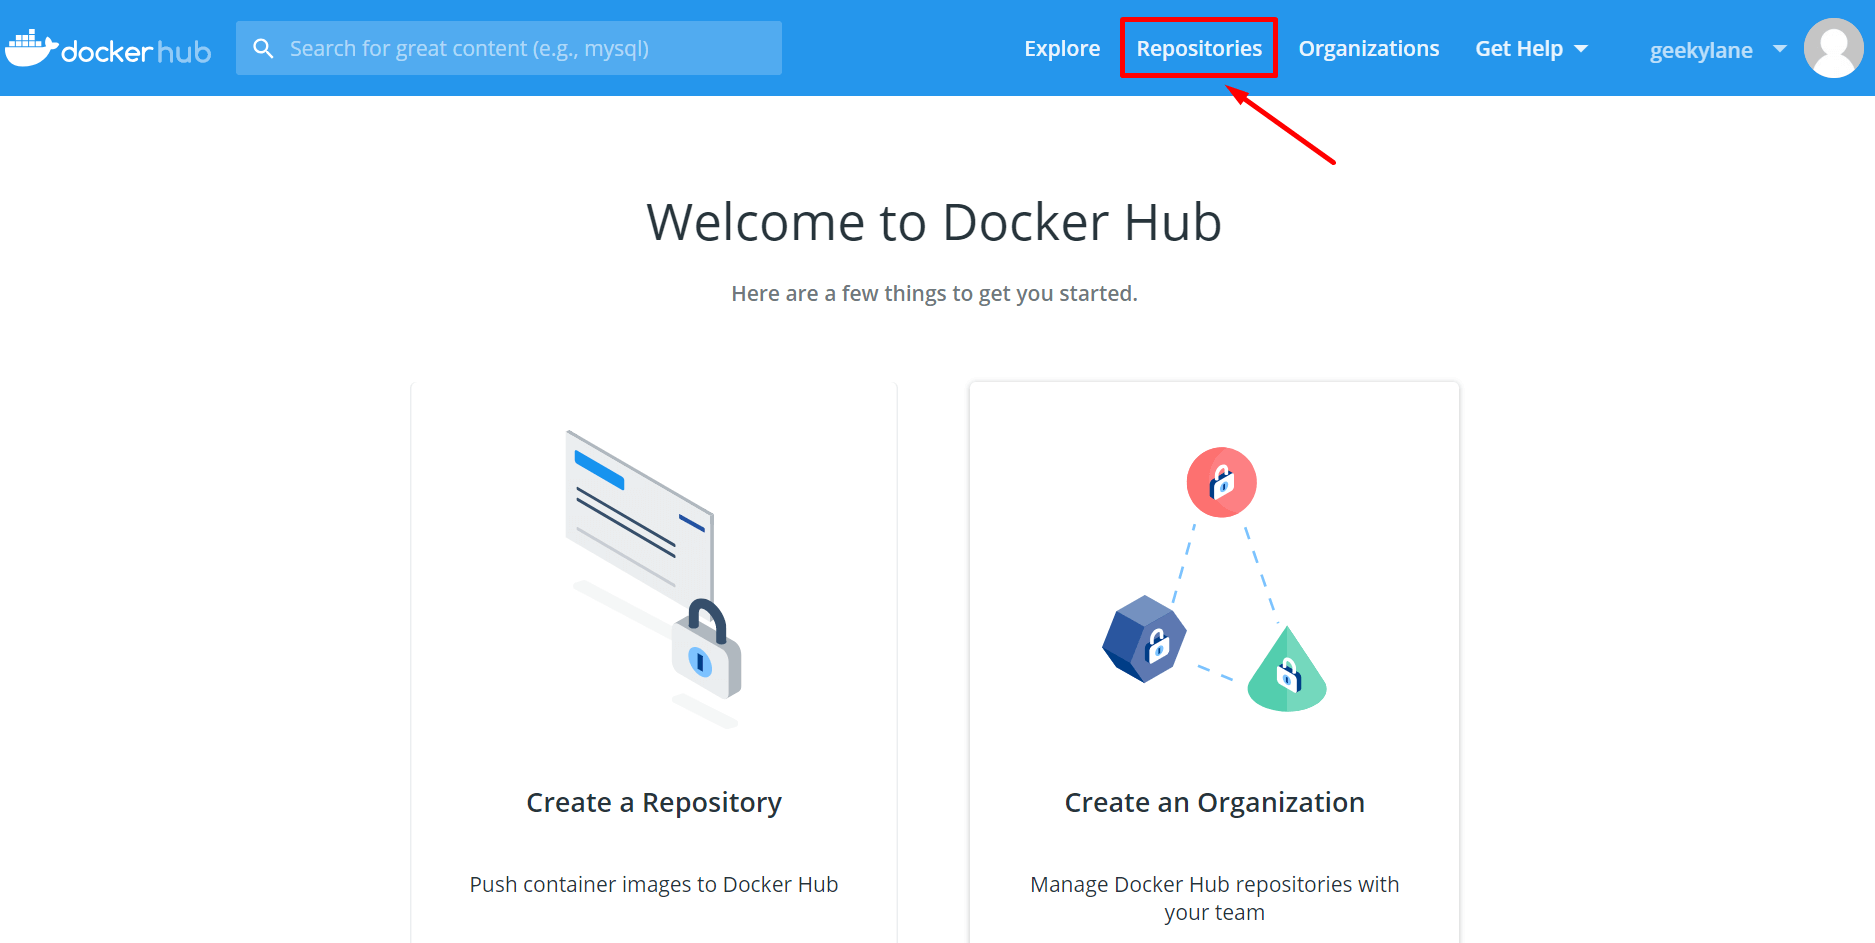 repositories in docker